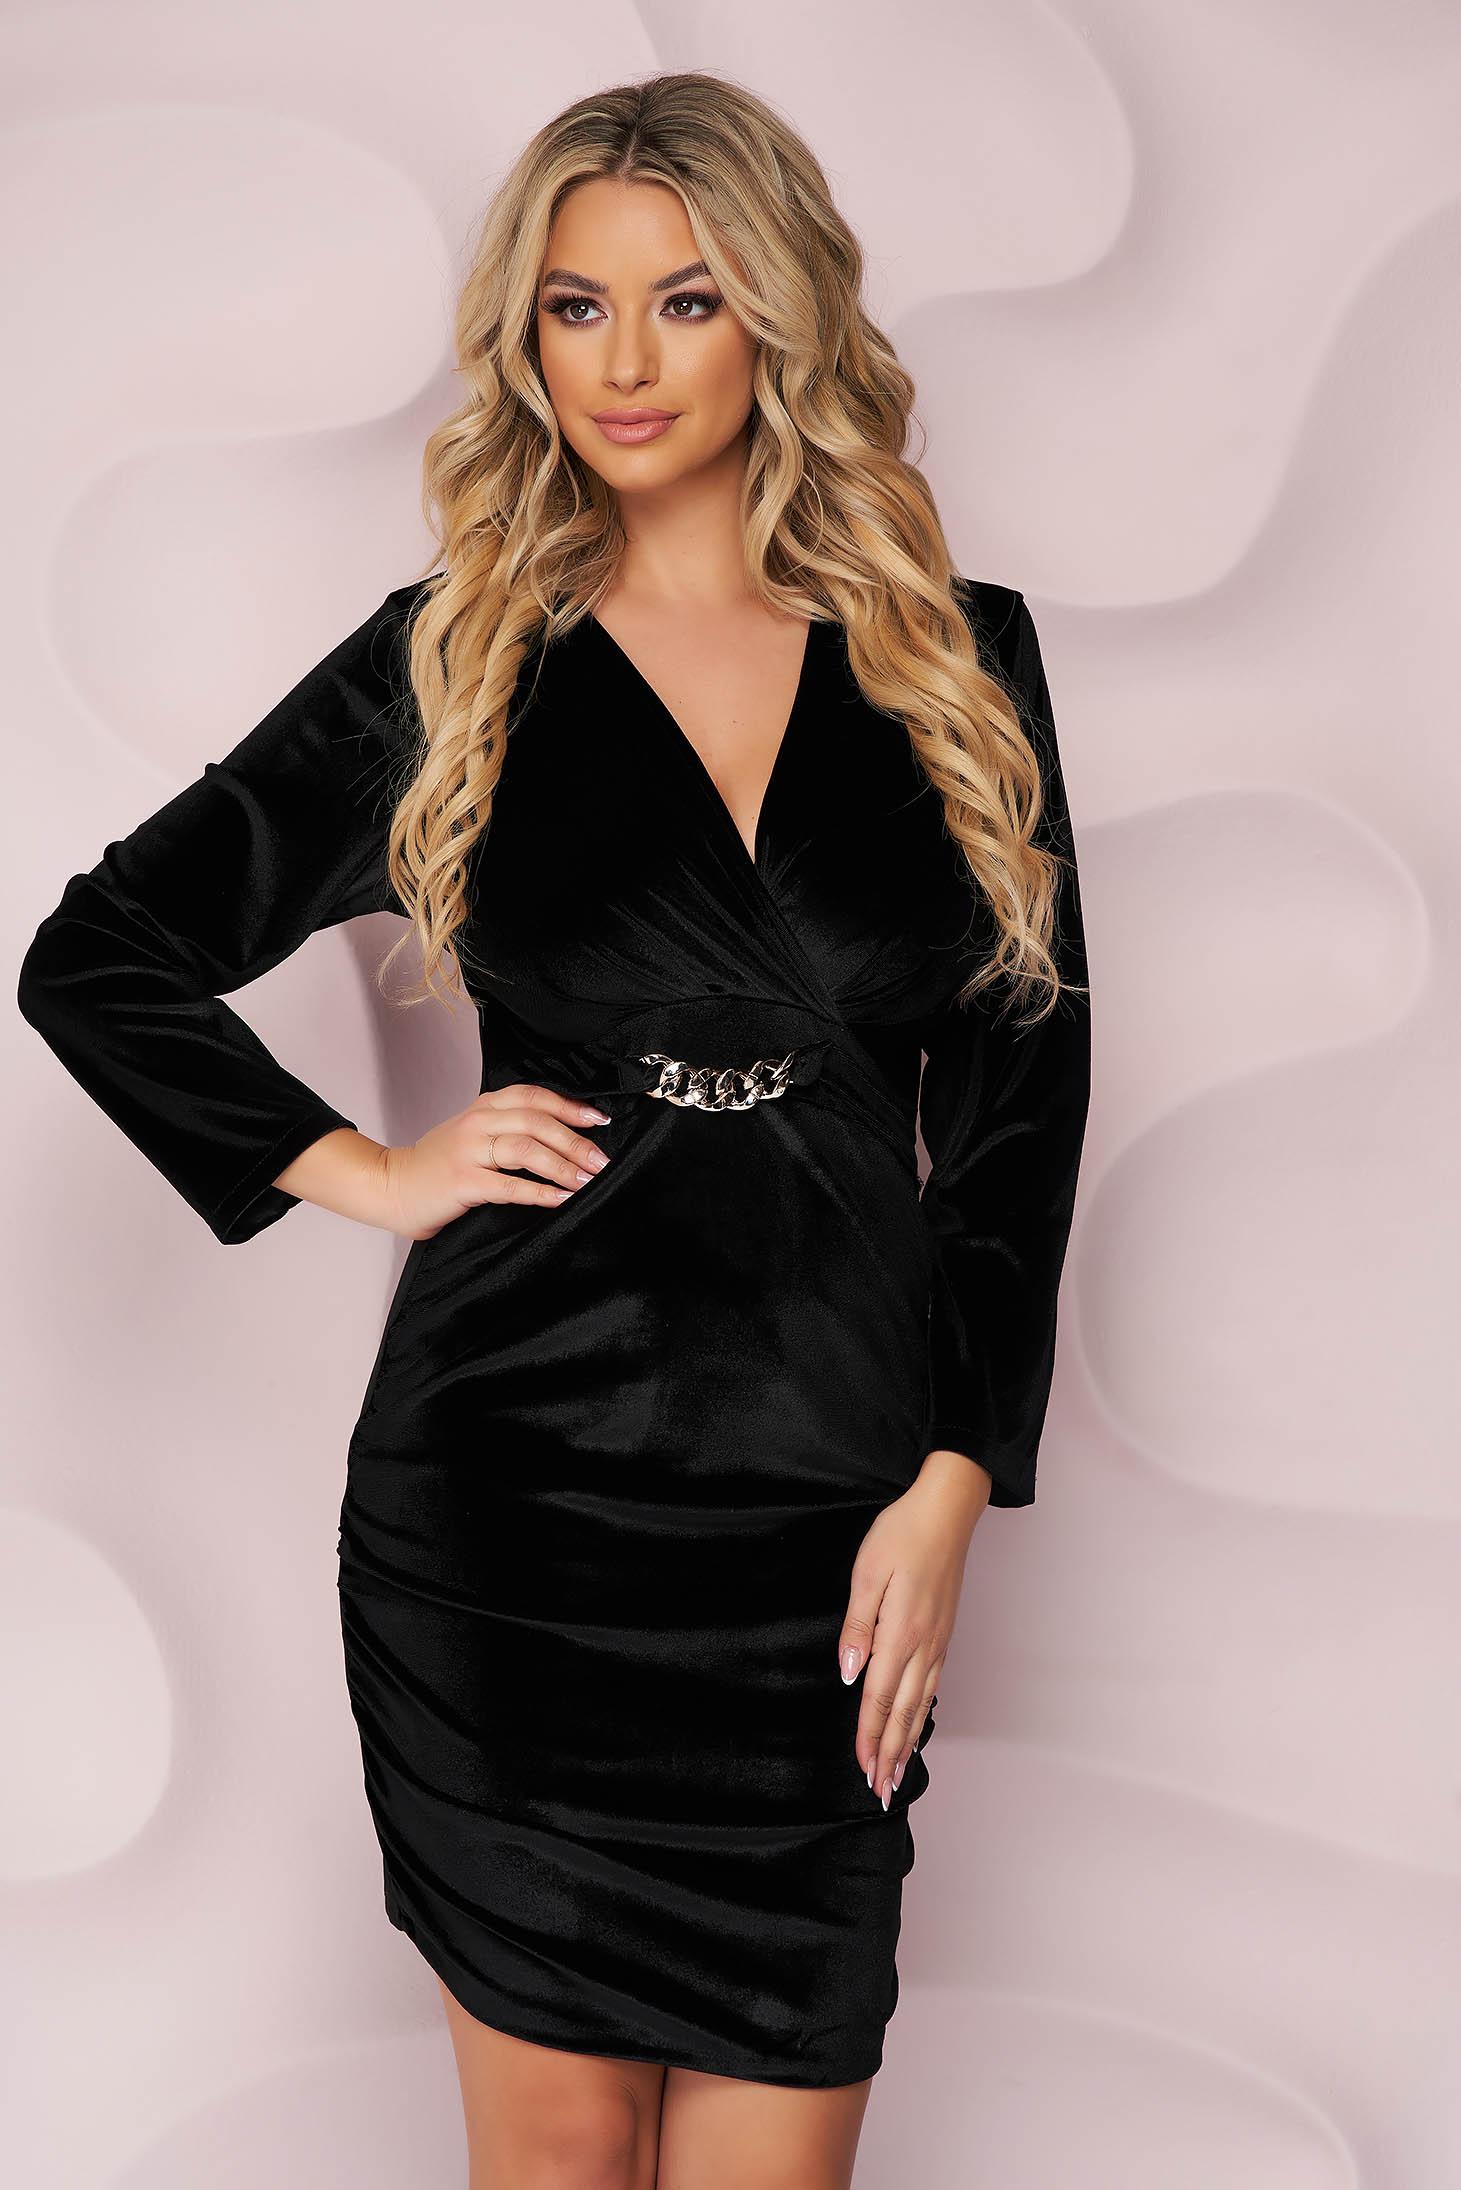 Black dress velvet occasional wrap over front metallic chain accessory